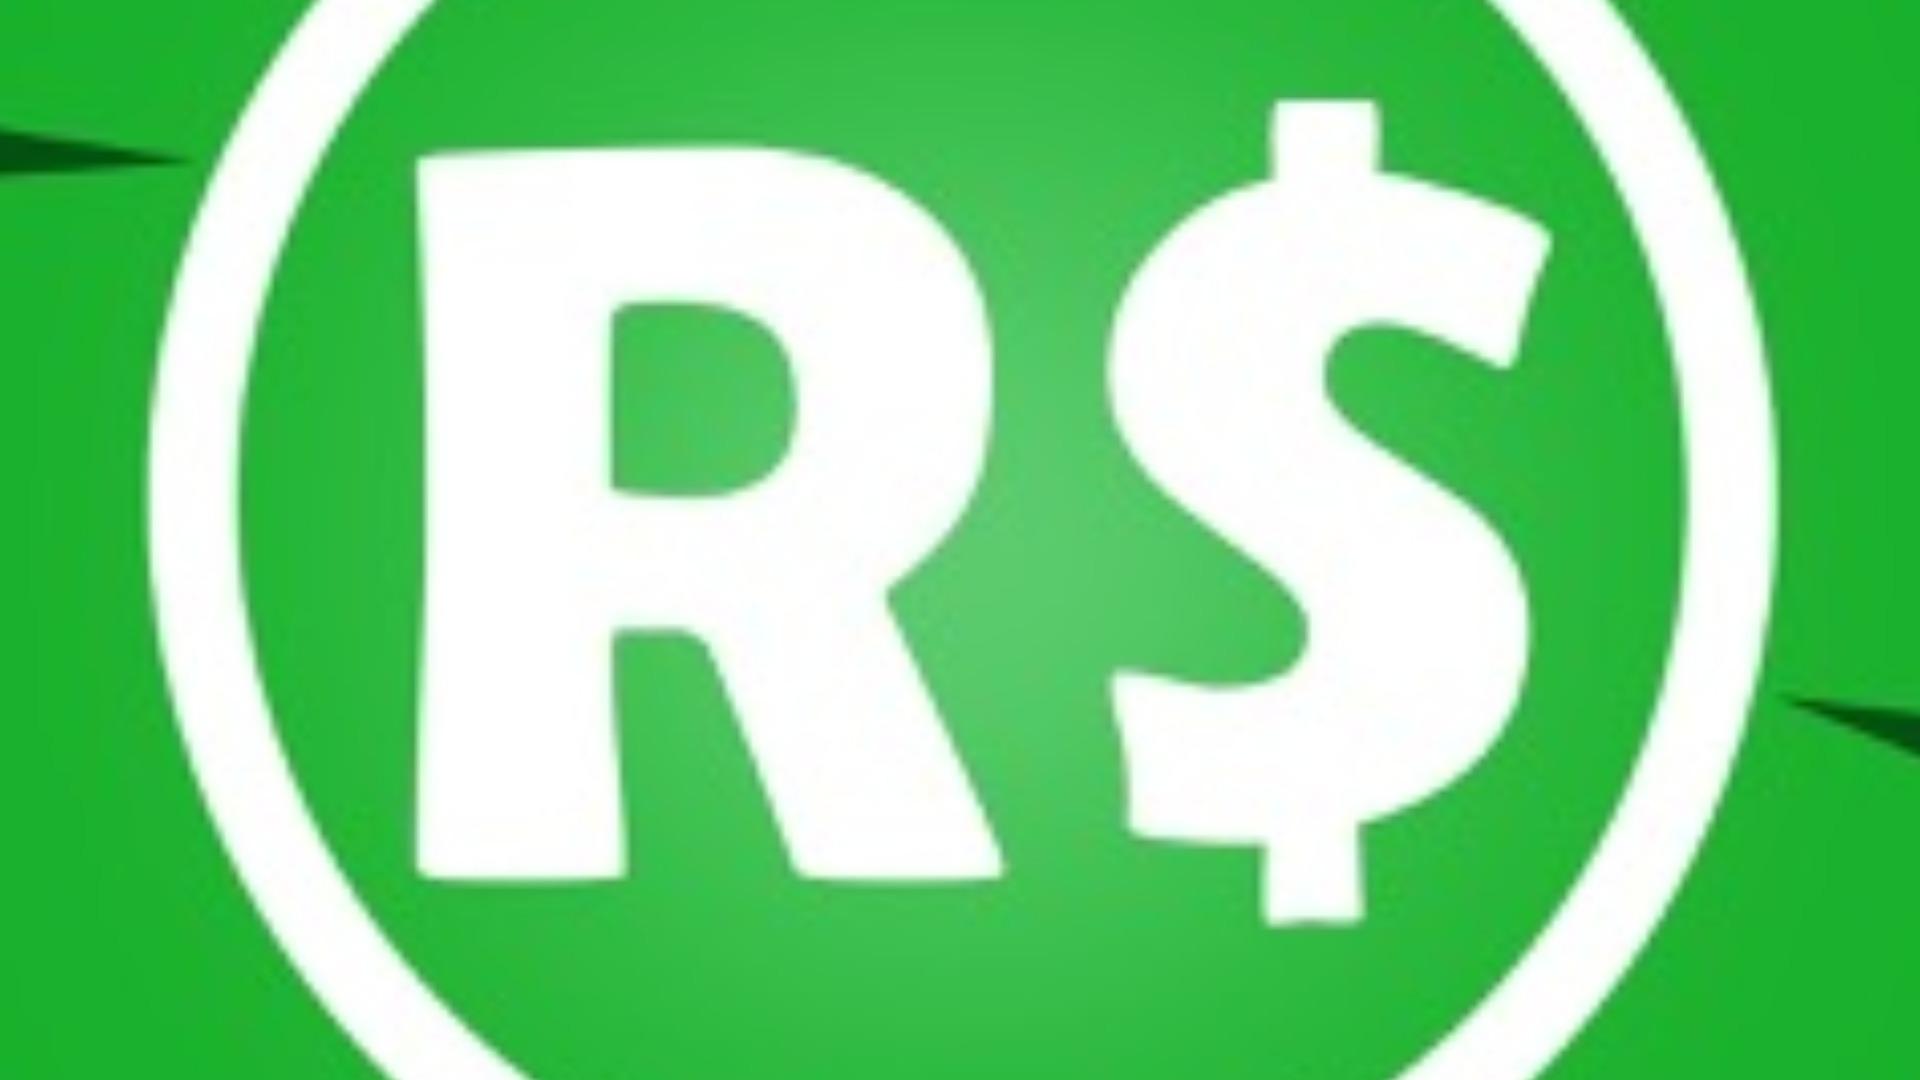 Free Robux Generator Unlimited Free Robux No Survey No